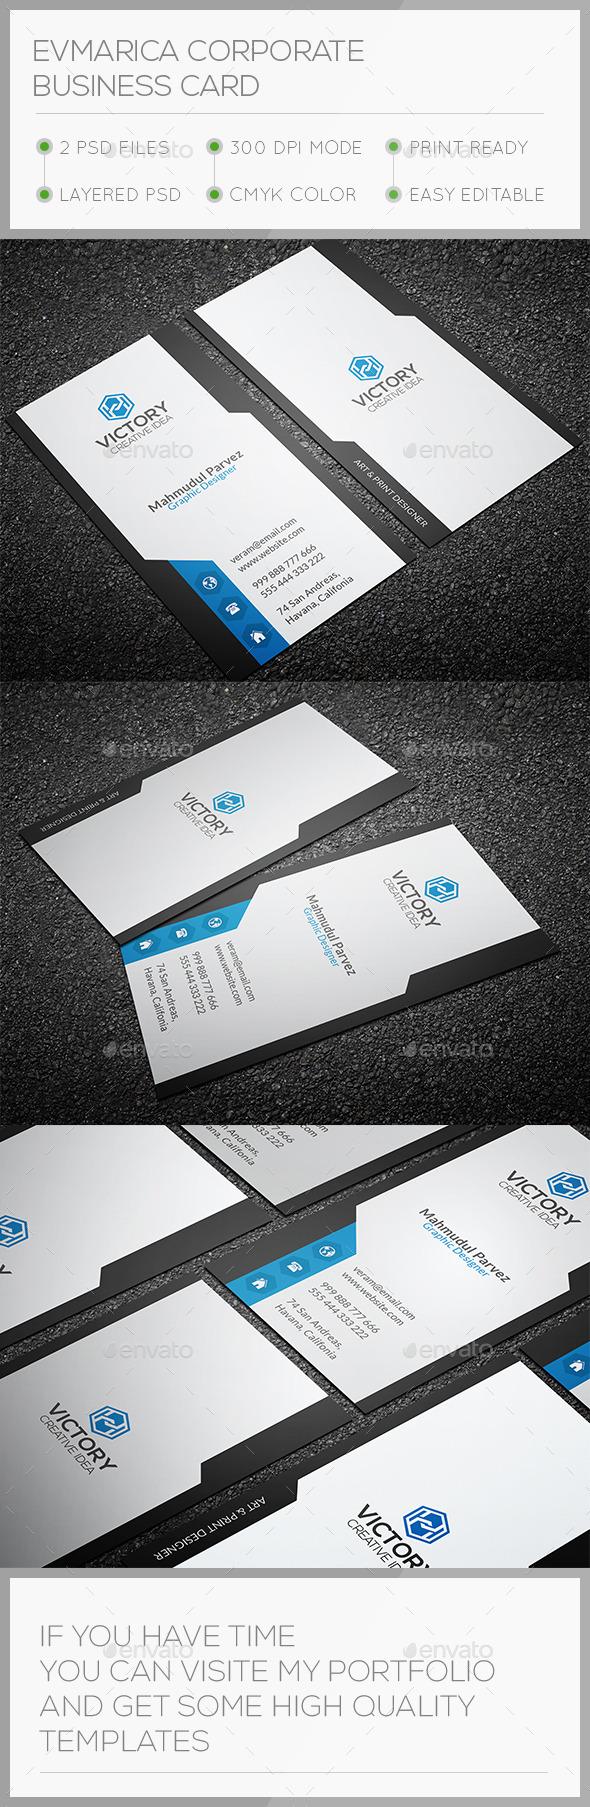 Evmarica Corporate Business Card - Corporate Business Cards